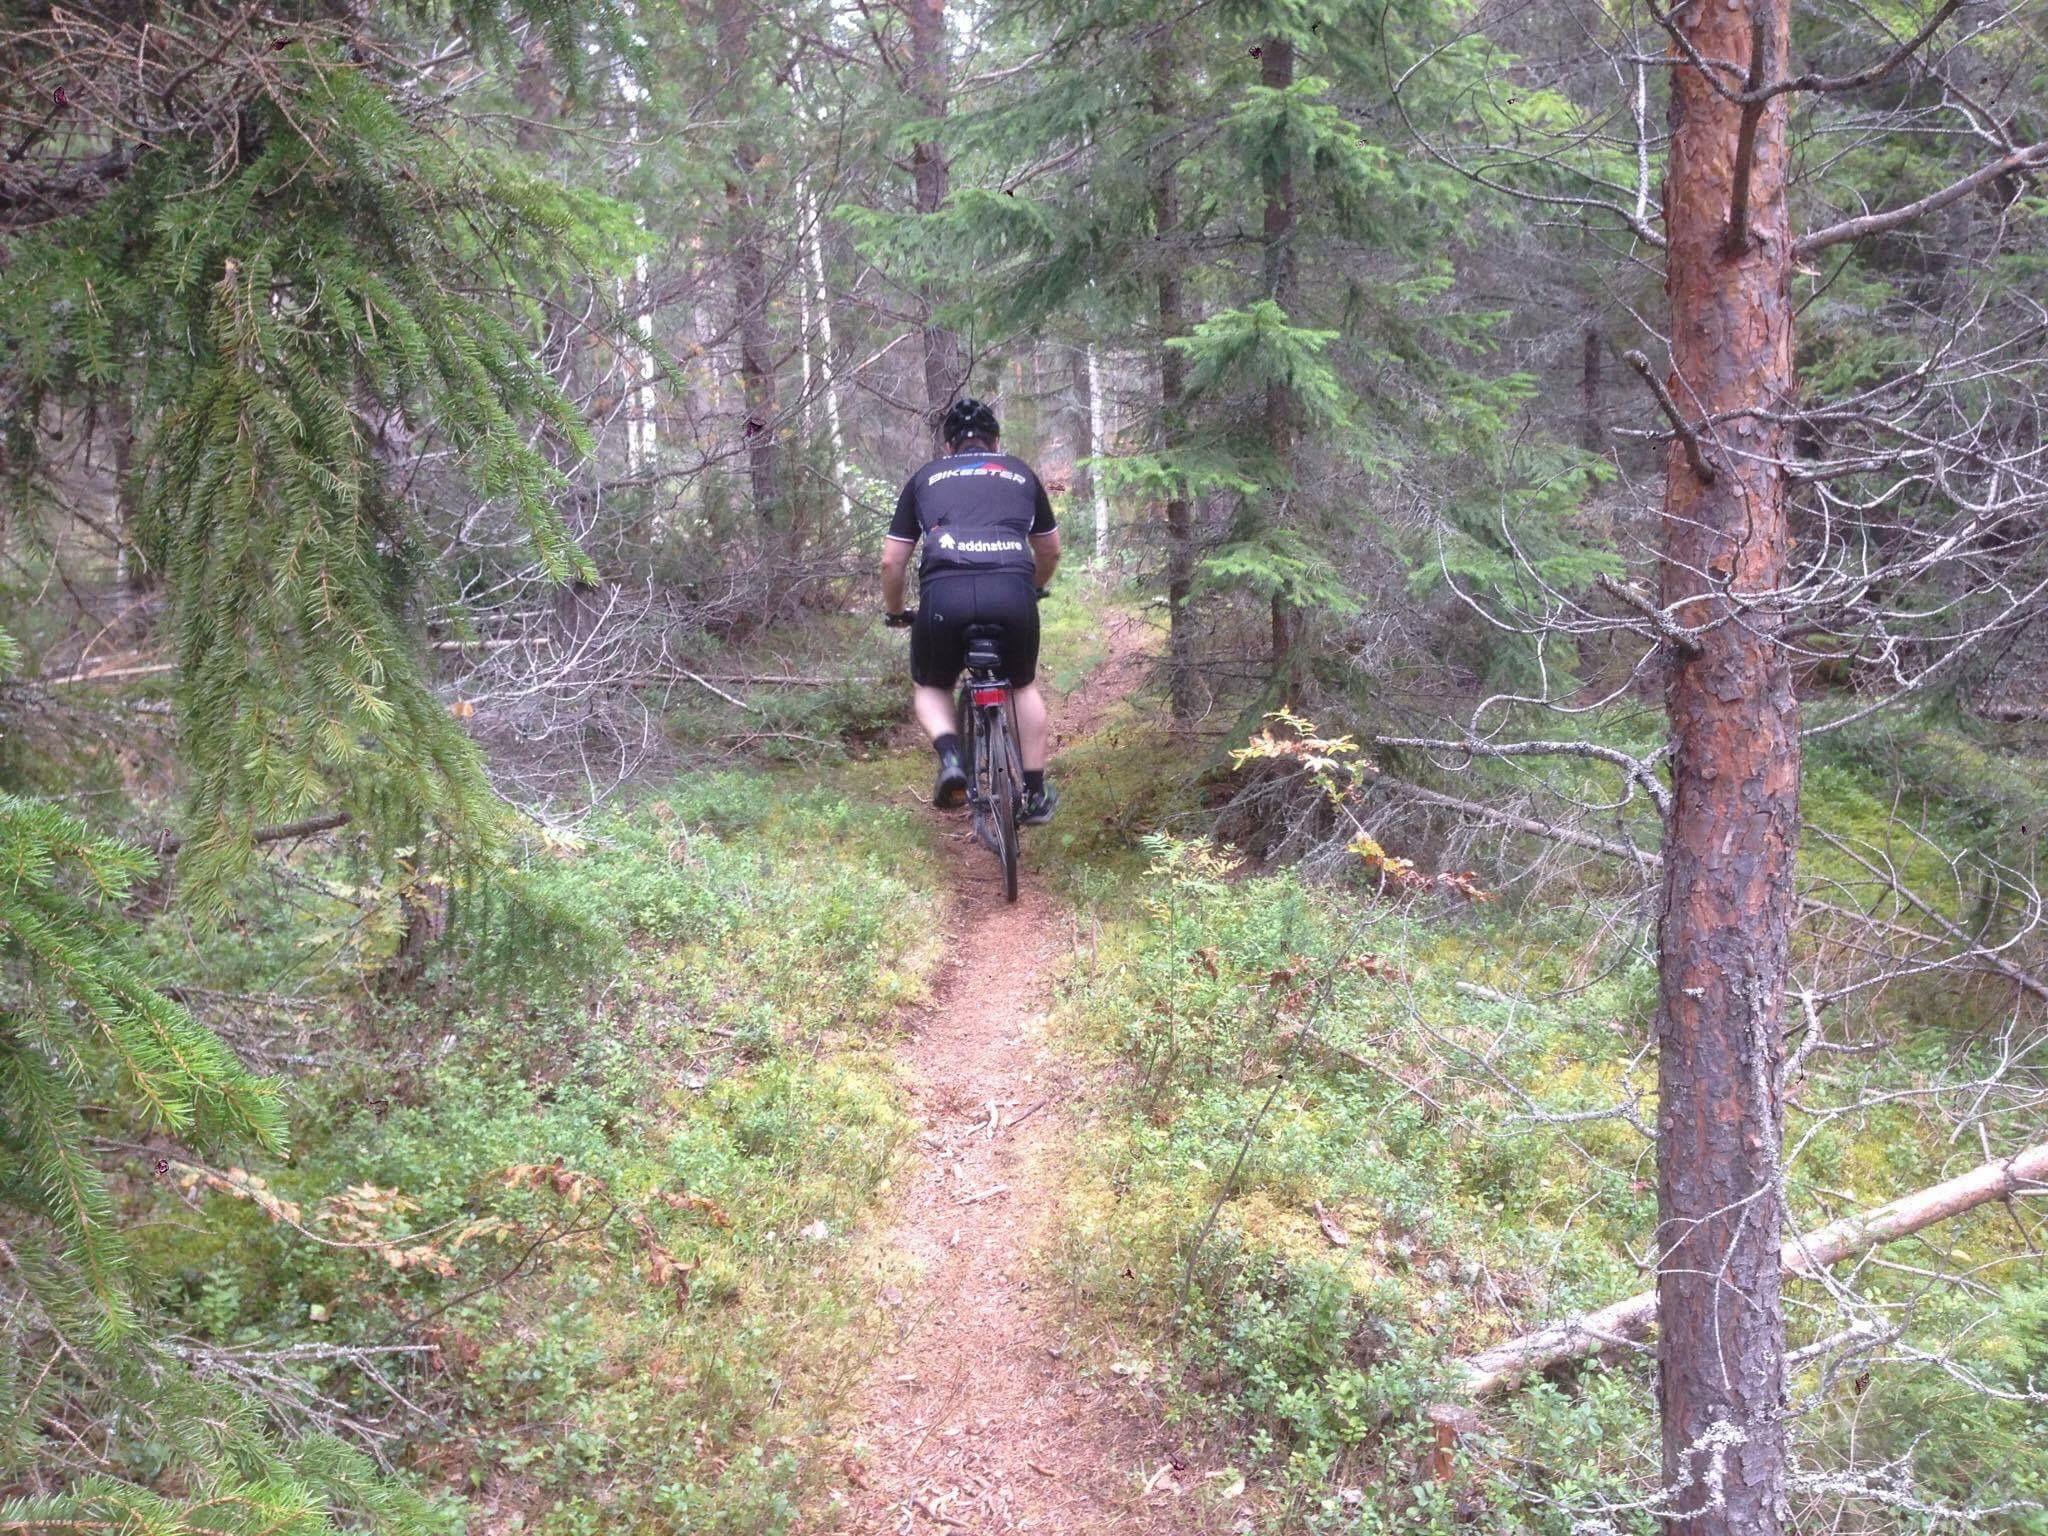 Cross country cykelled i Järvsö